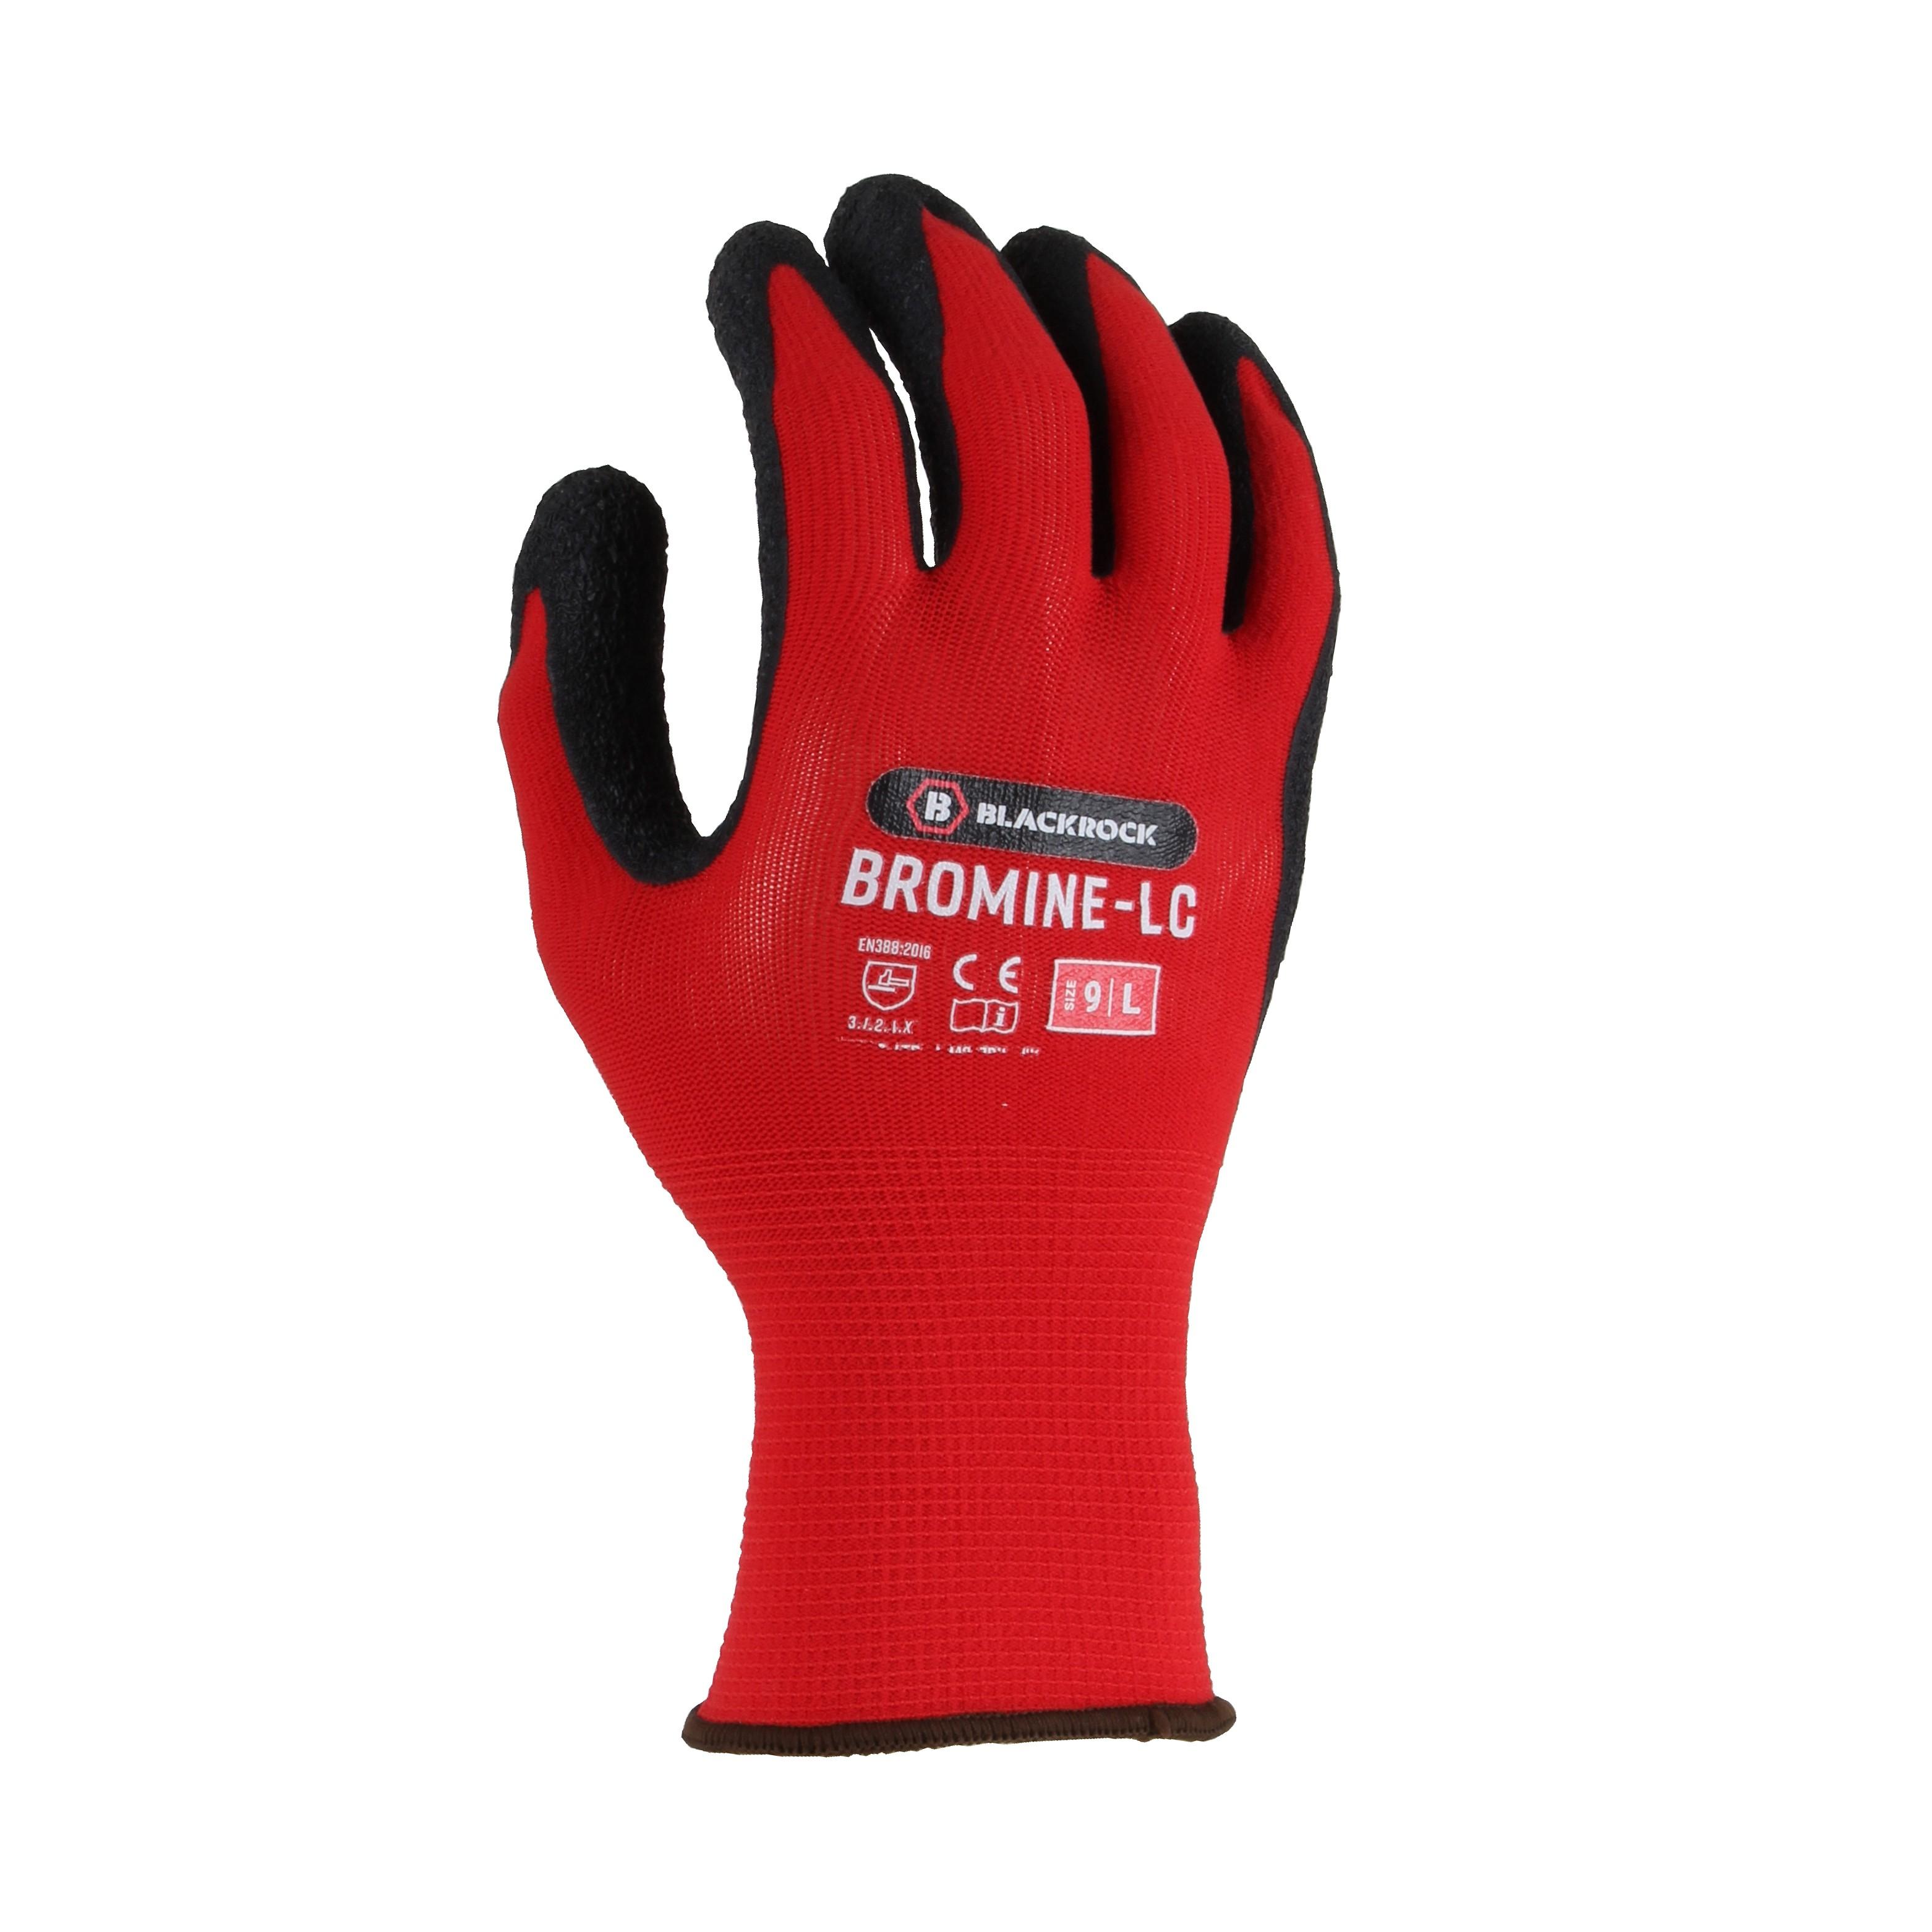 Bromine-LC Work Glove